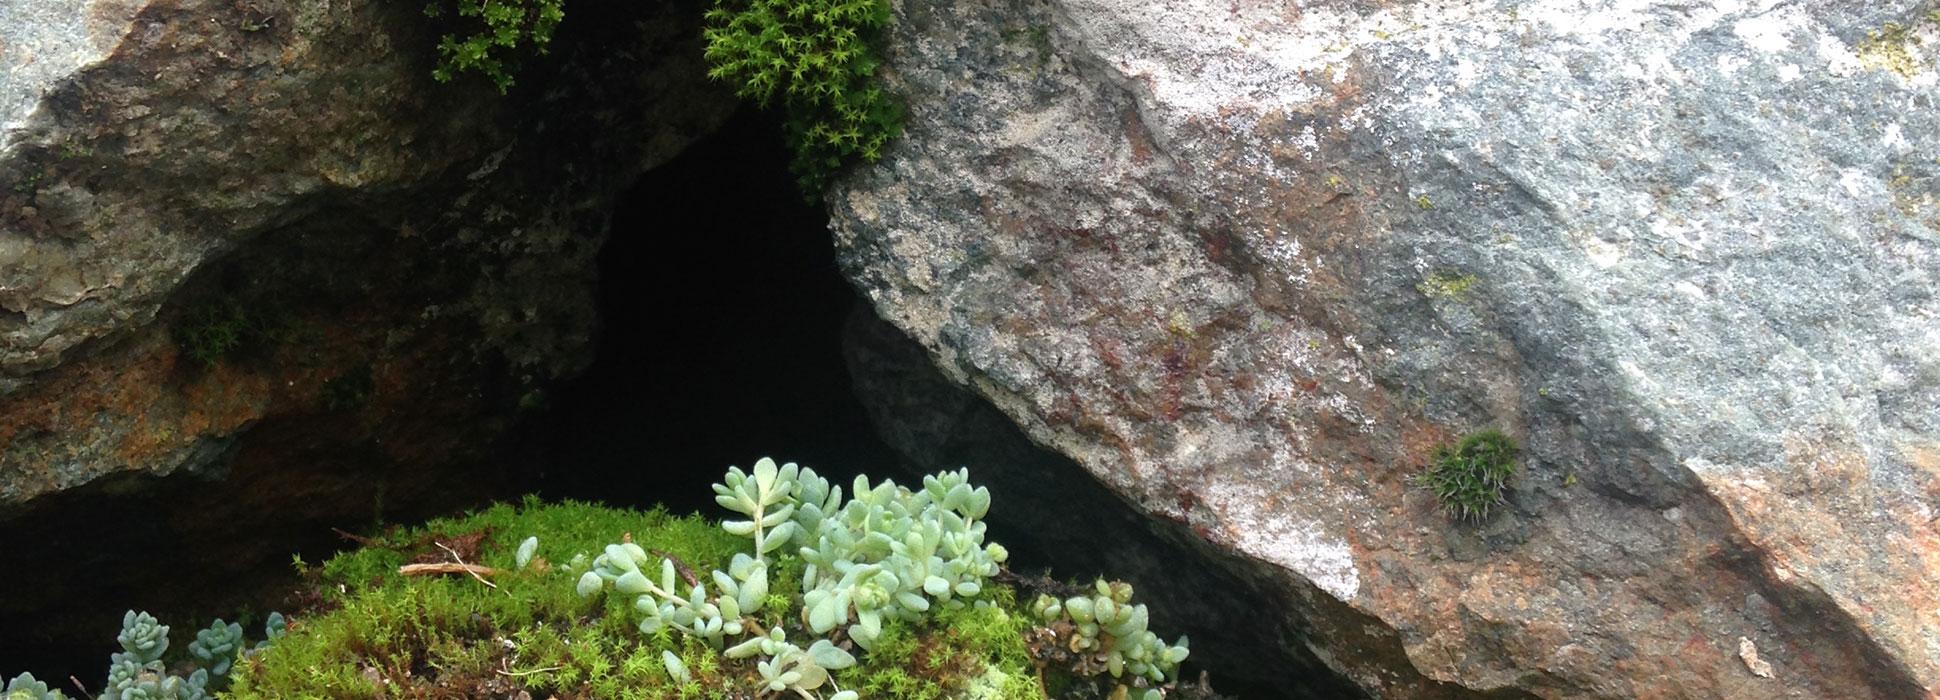 Despoina-Zavraka_Expanded-Natures_cover